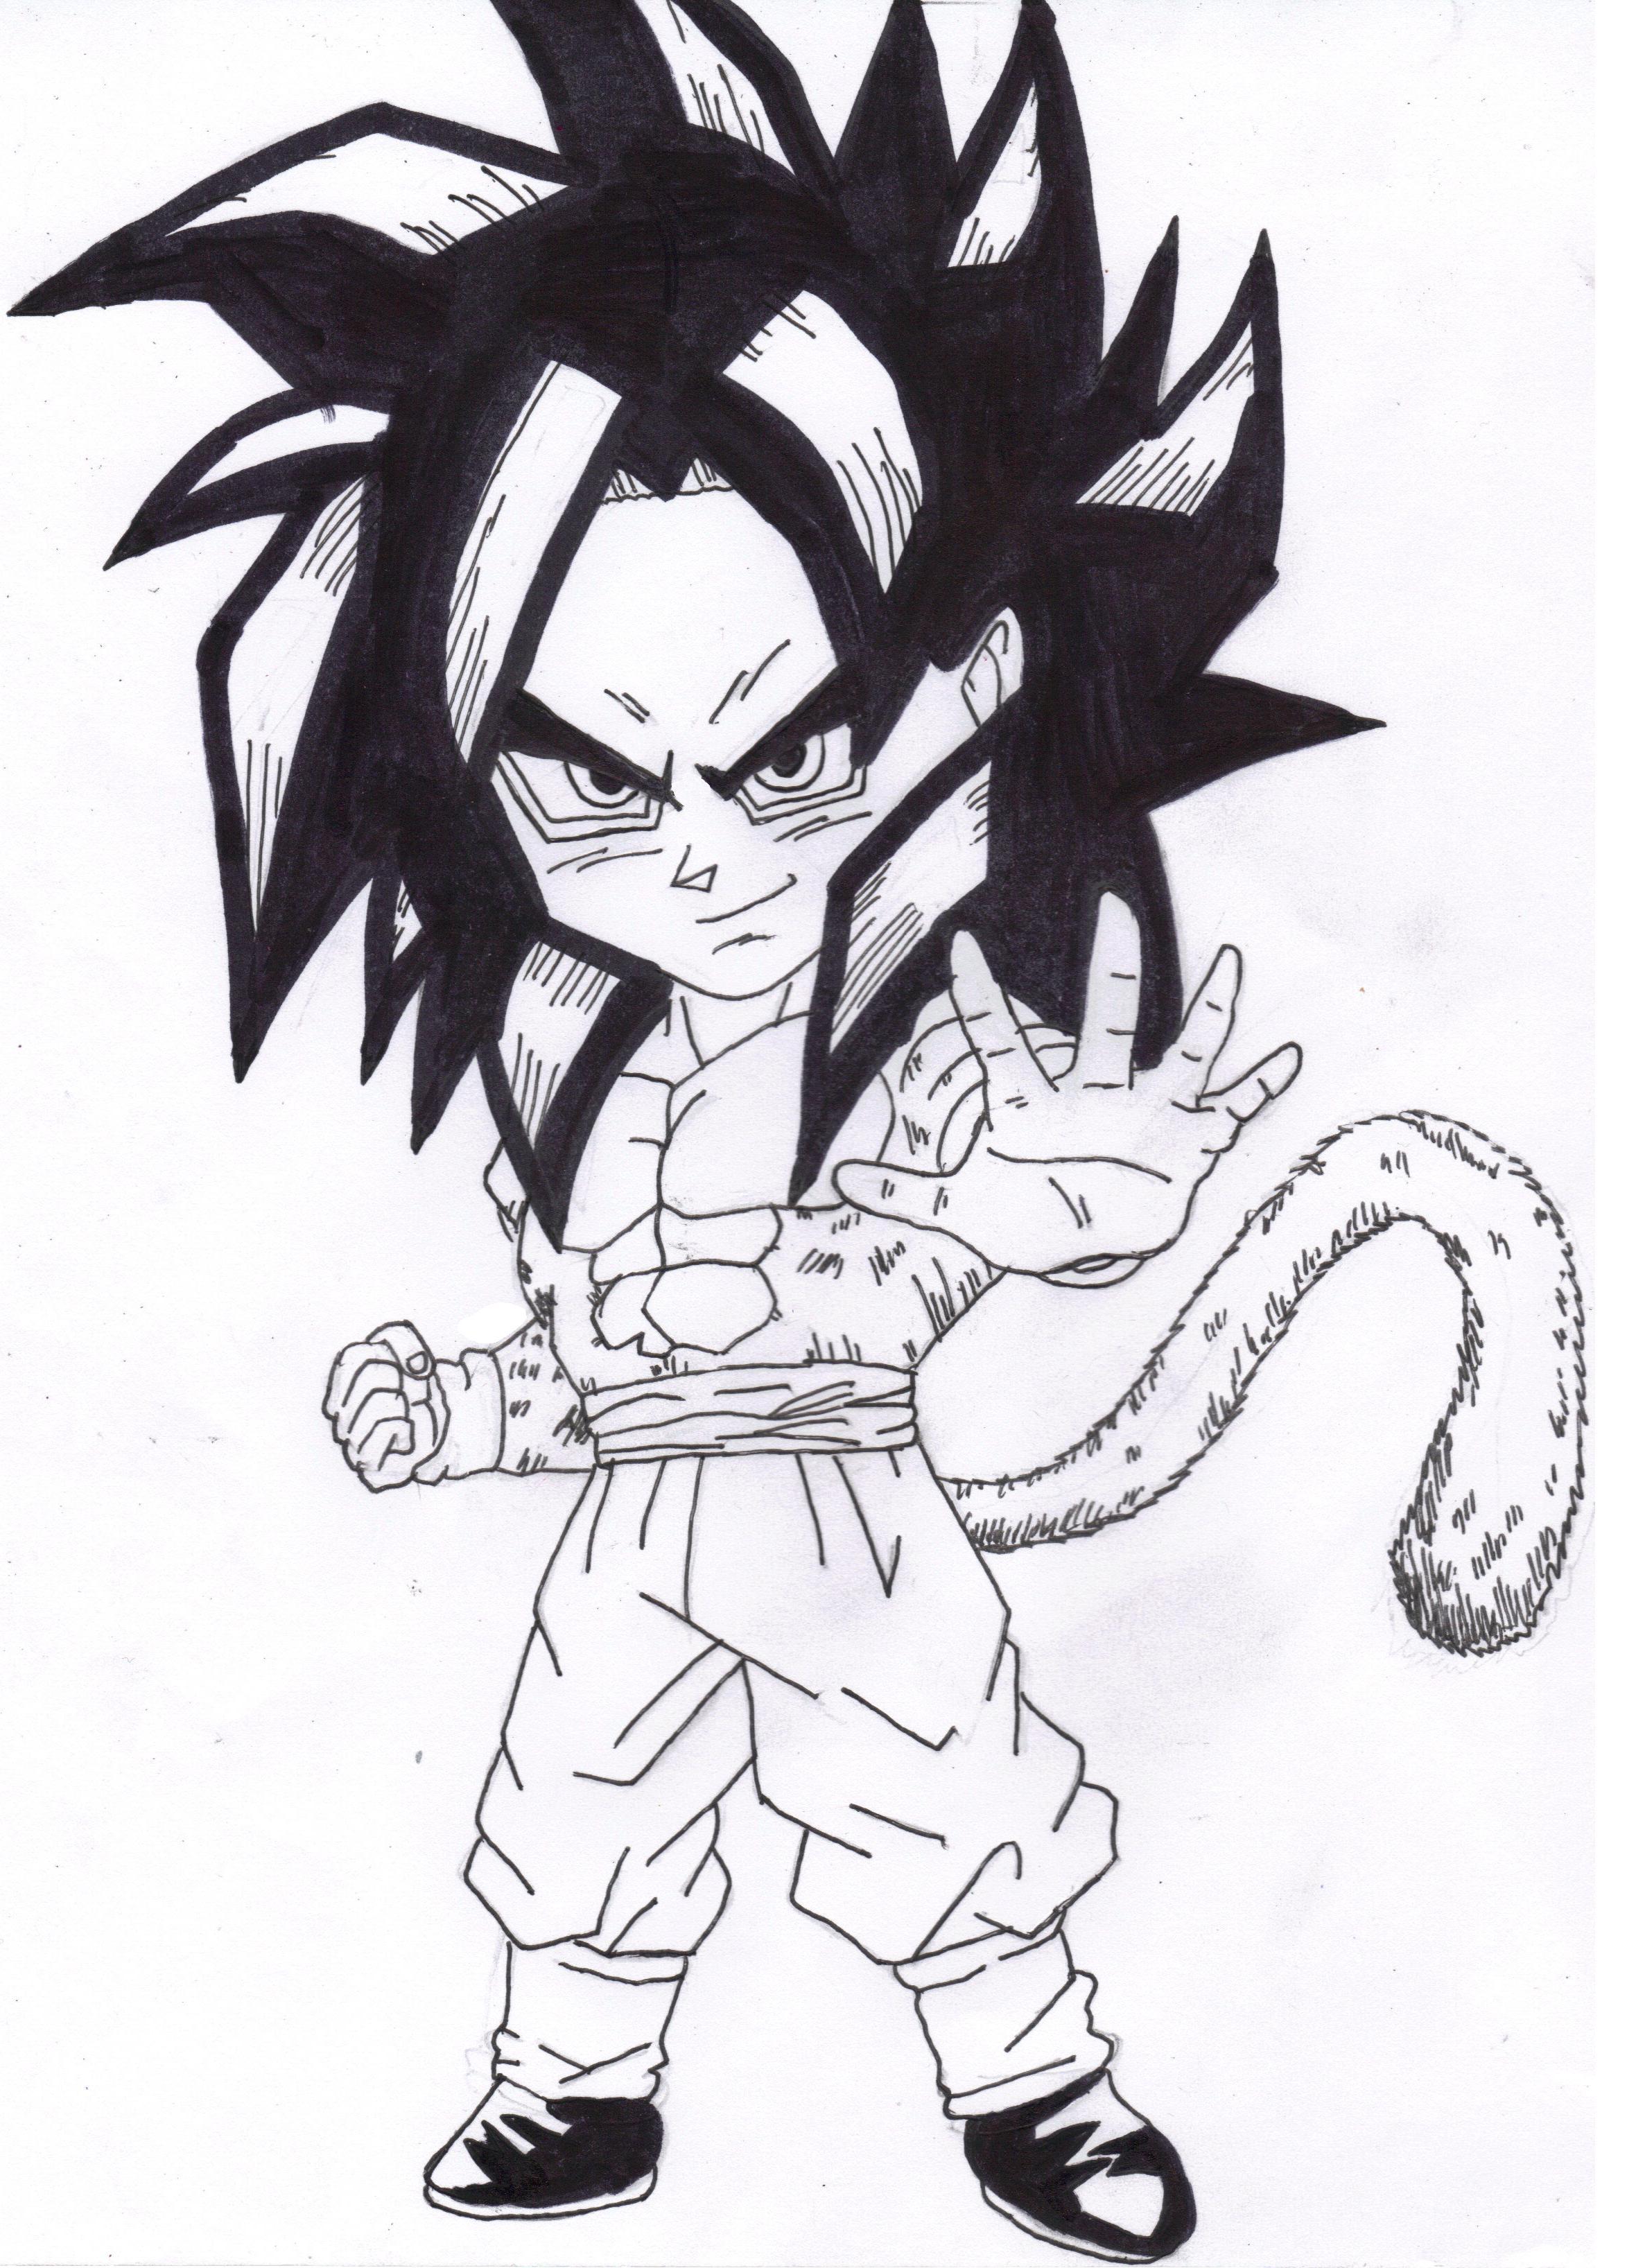 Goku Super Saiyan 4 Drawing At Getdrawings Com Free For